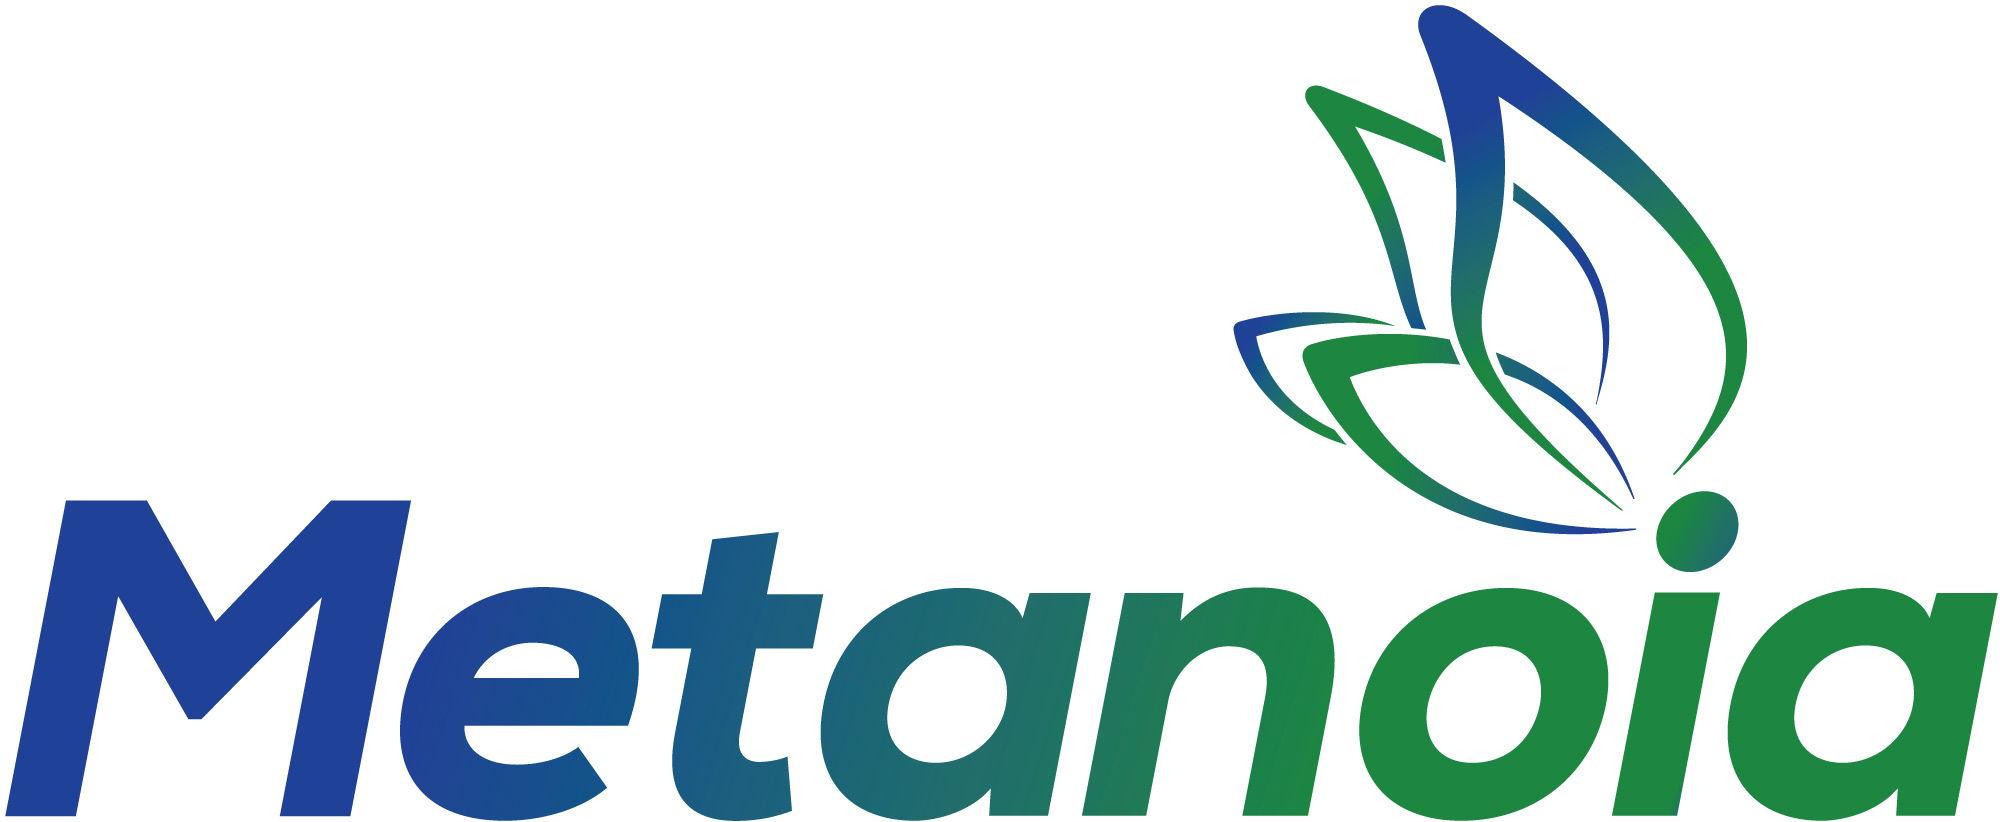 Metanoia Color Logo.jpg